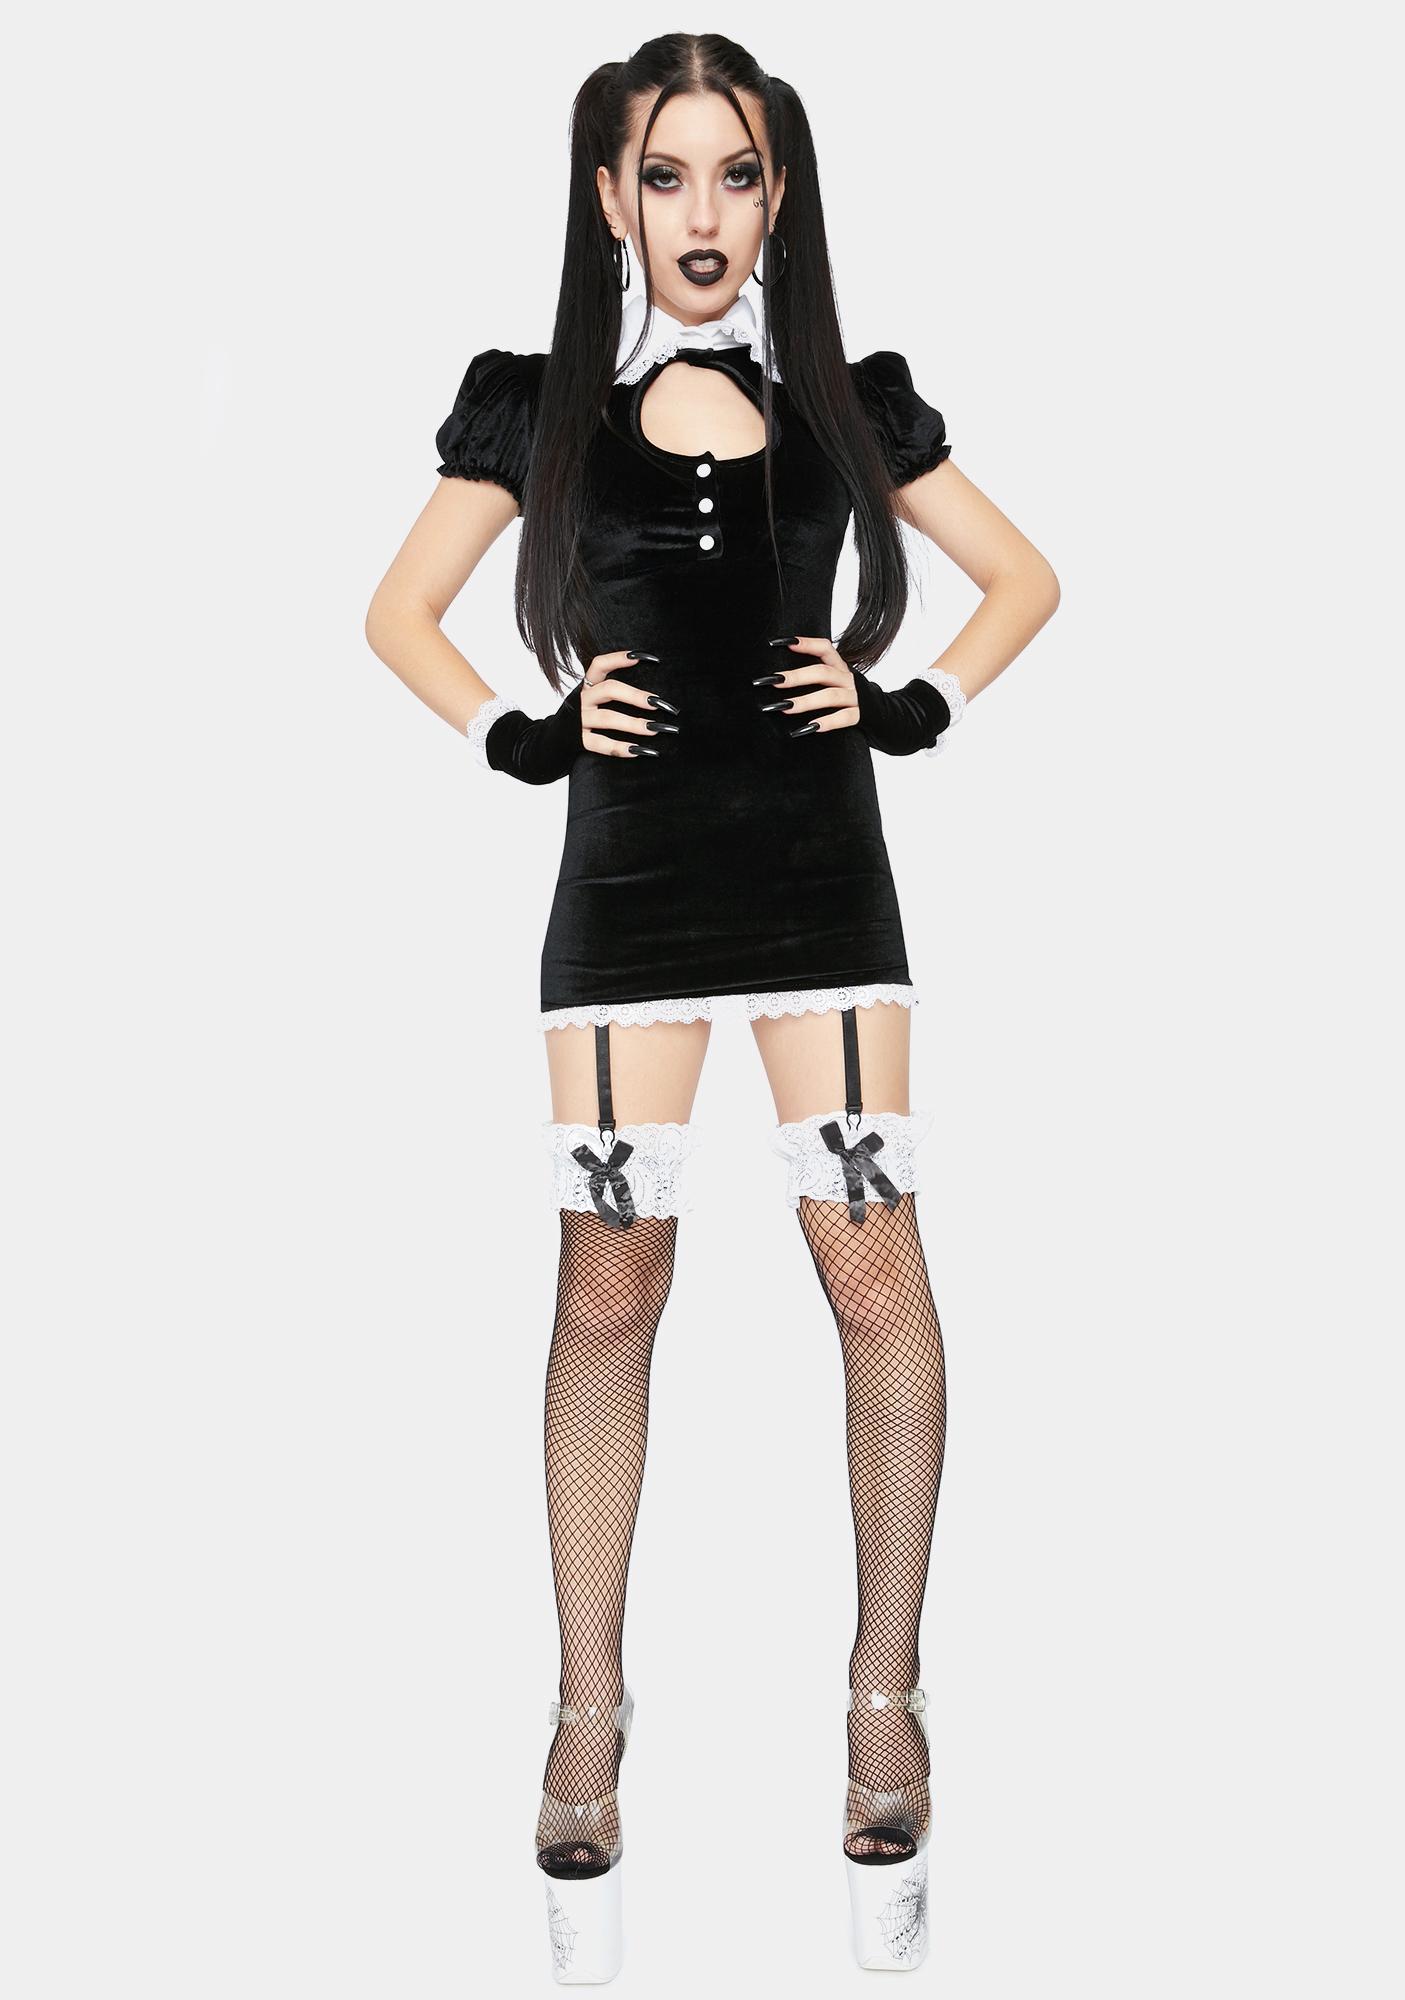 Forplay Woman Crush Wednesday Costume